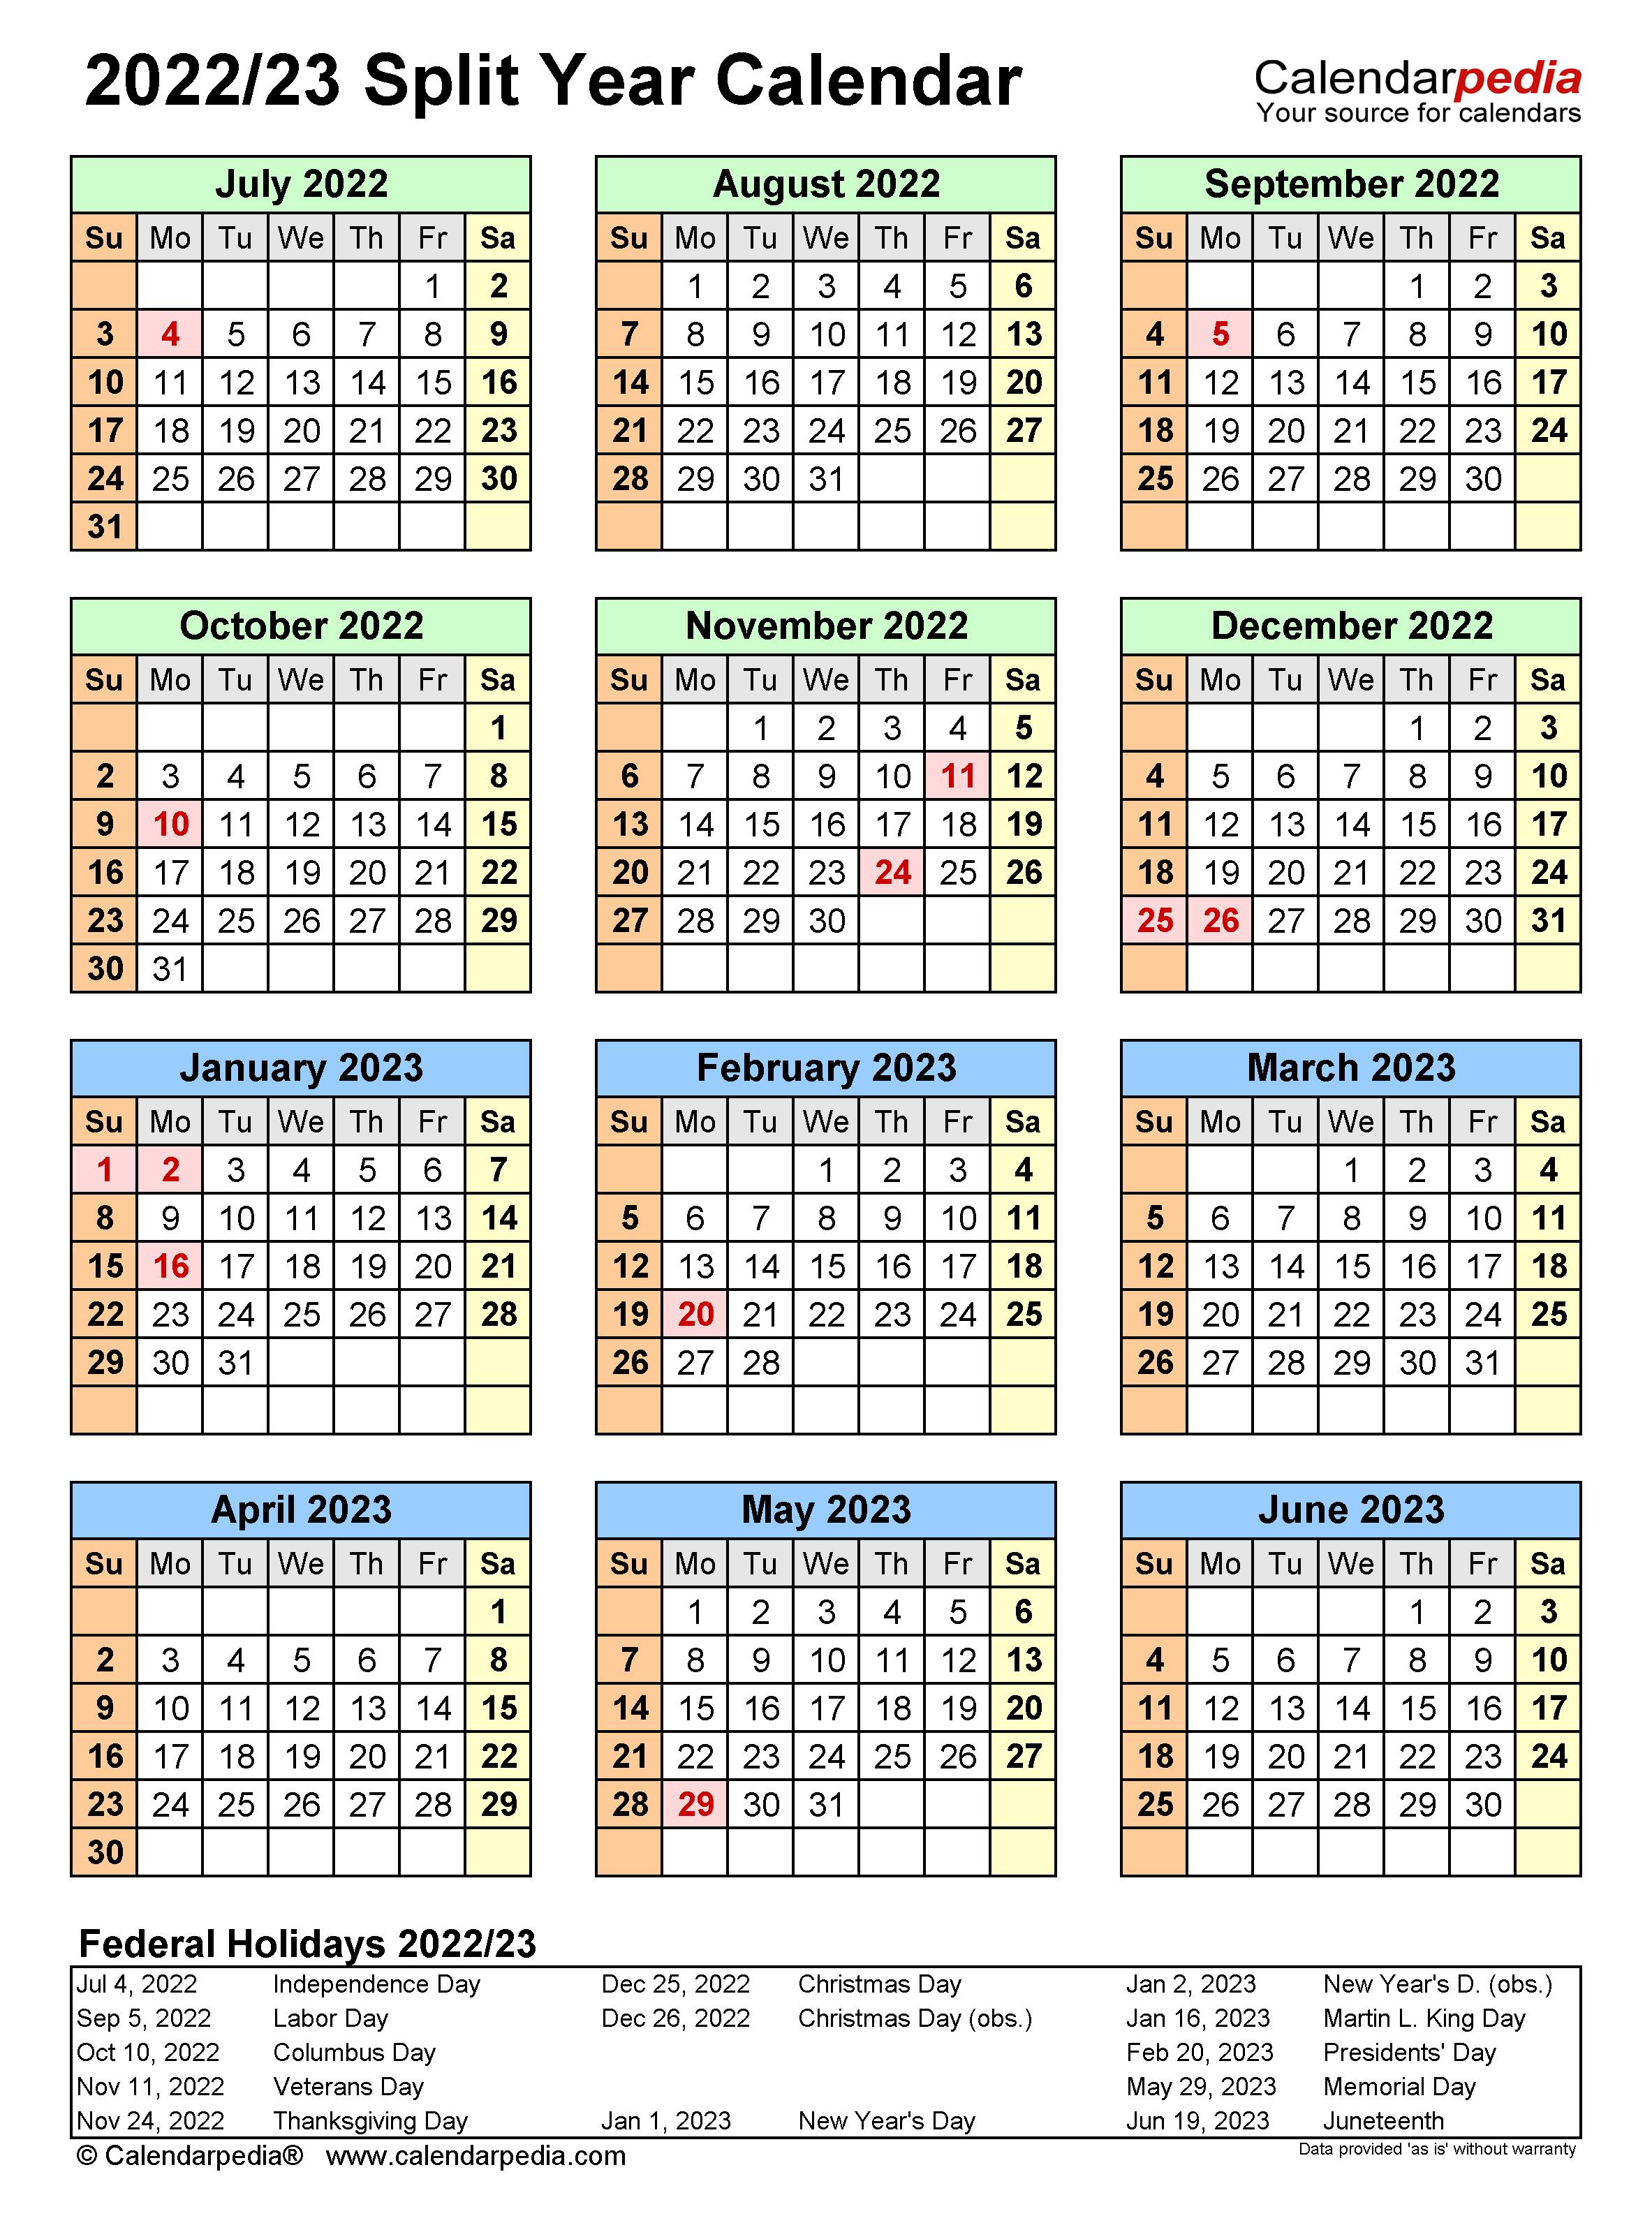 Yale Calendar 2022 2023.Split Year Calendars 2022 2023 July To June Pdf Templates